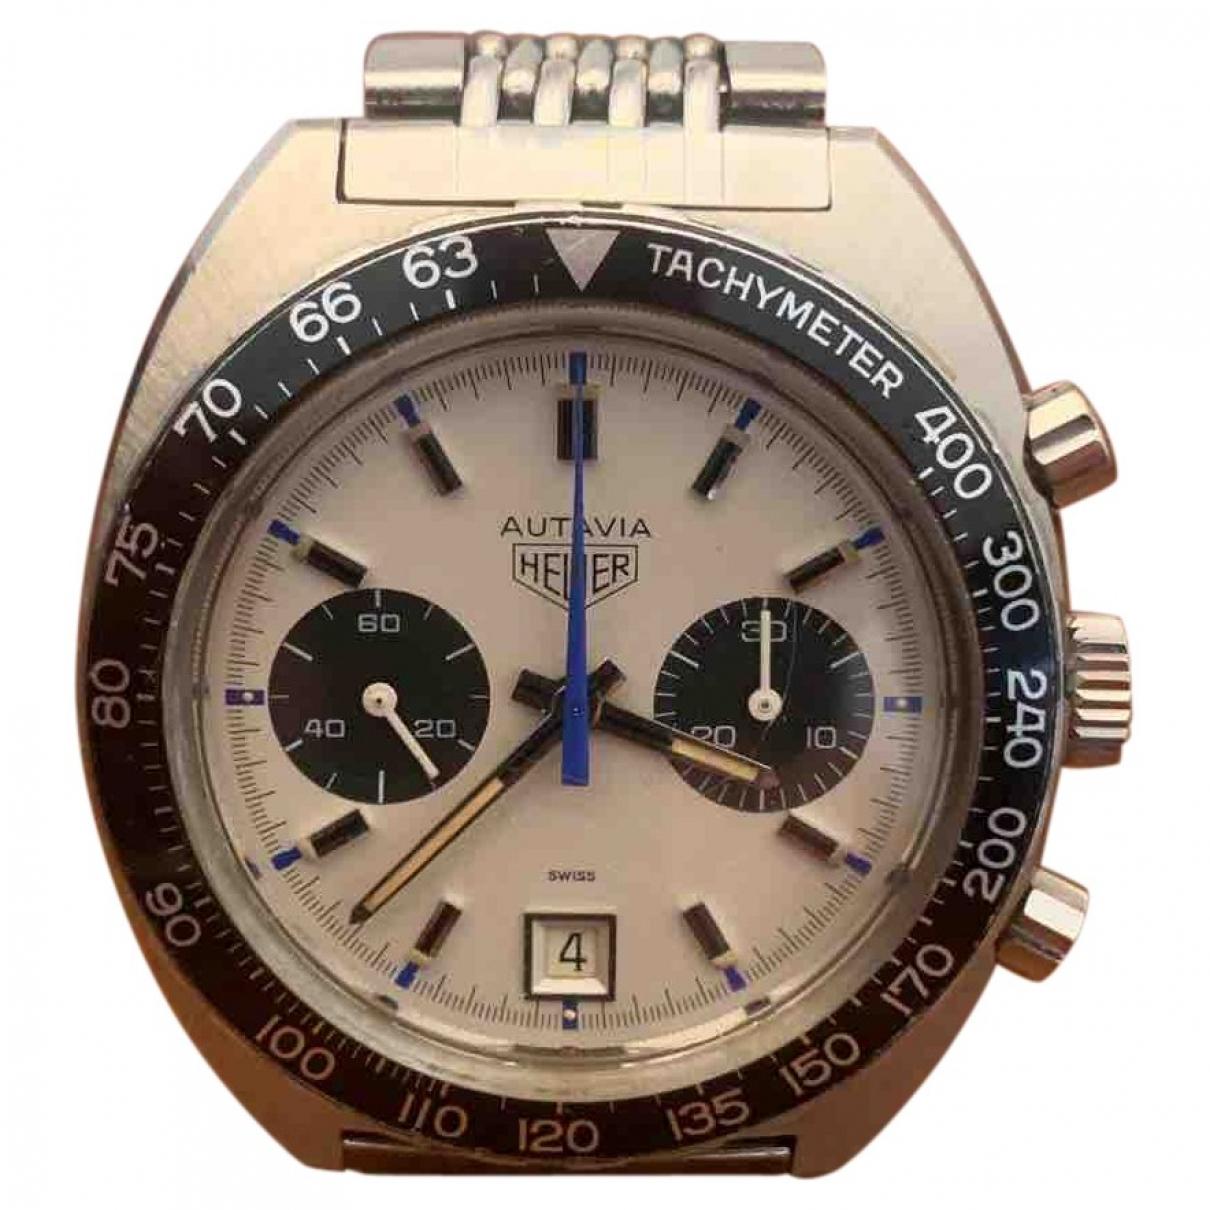 Relojes Autavia Chronographe Heuer